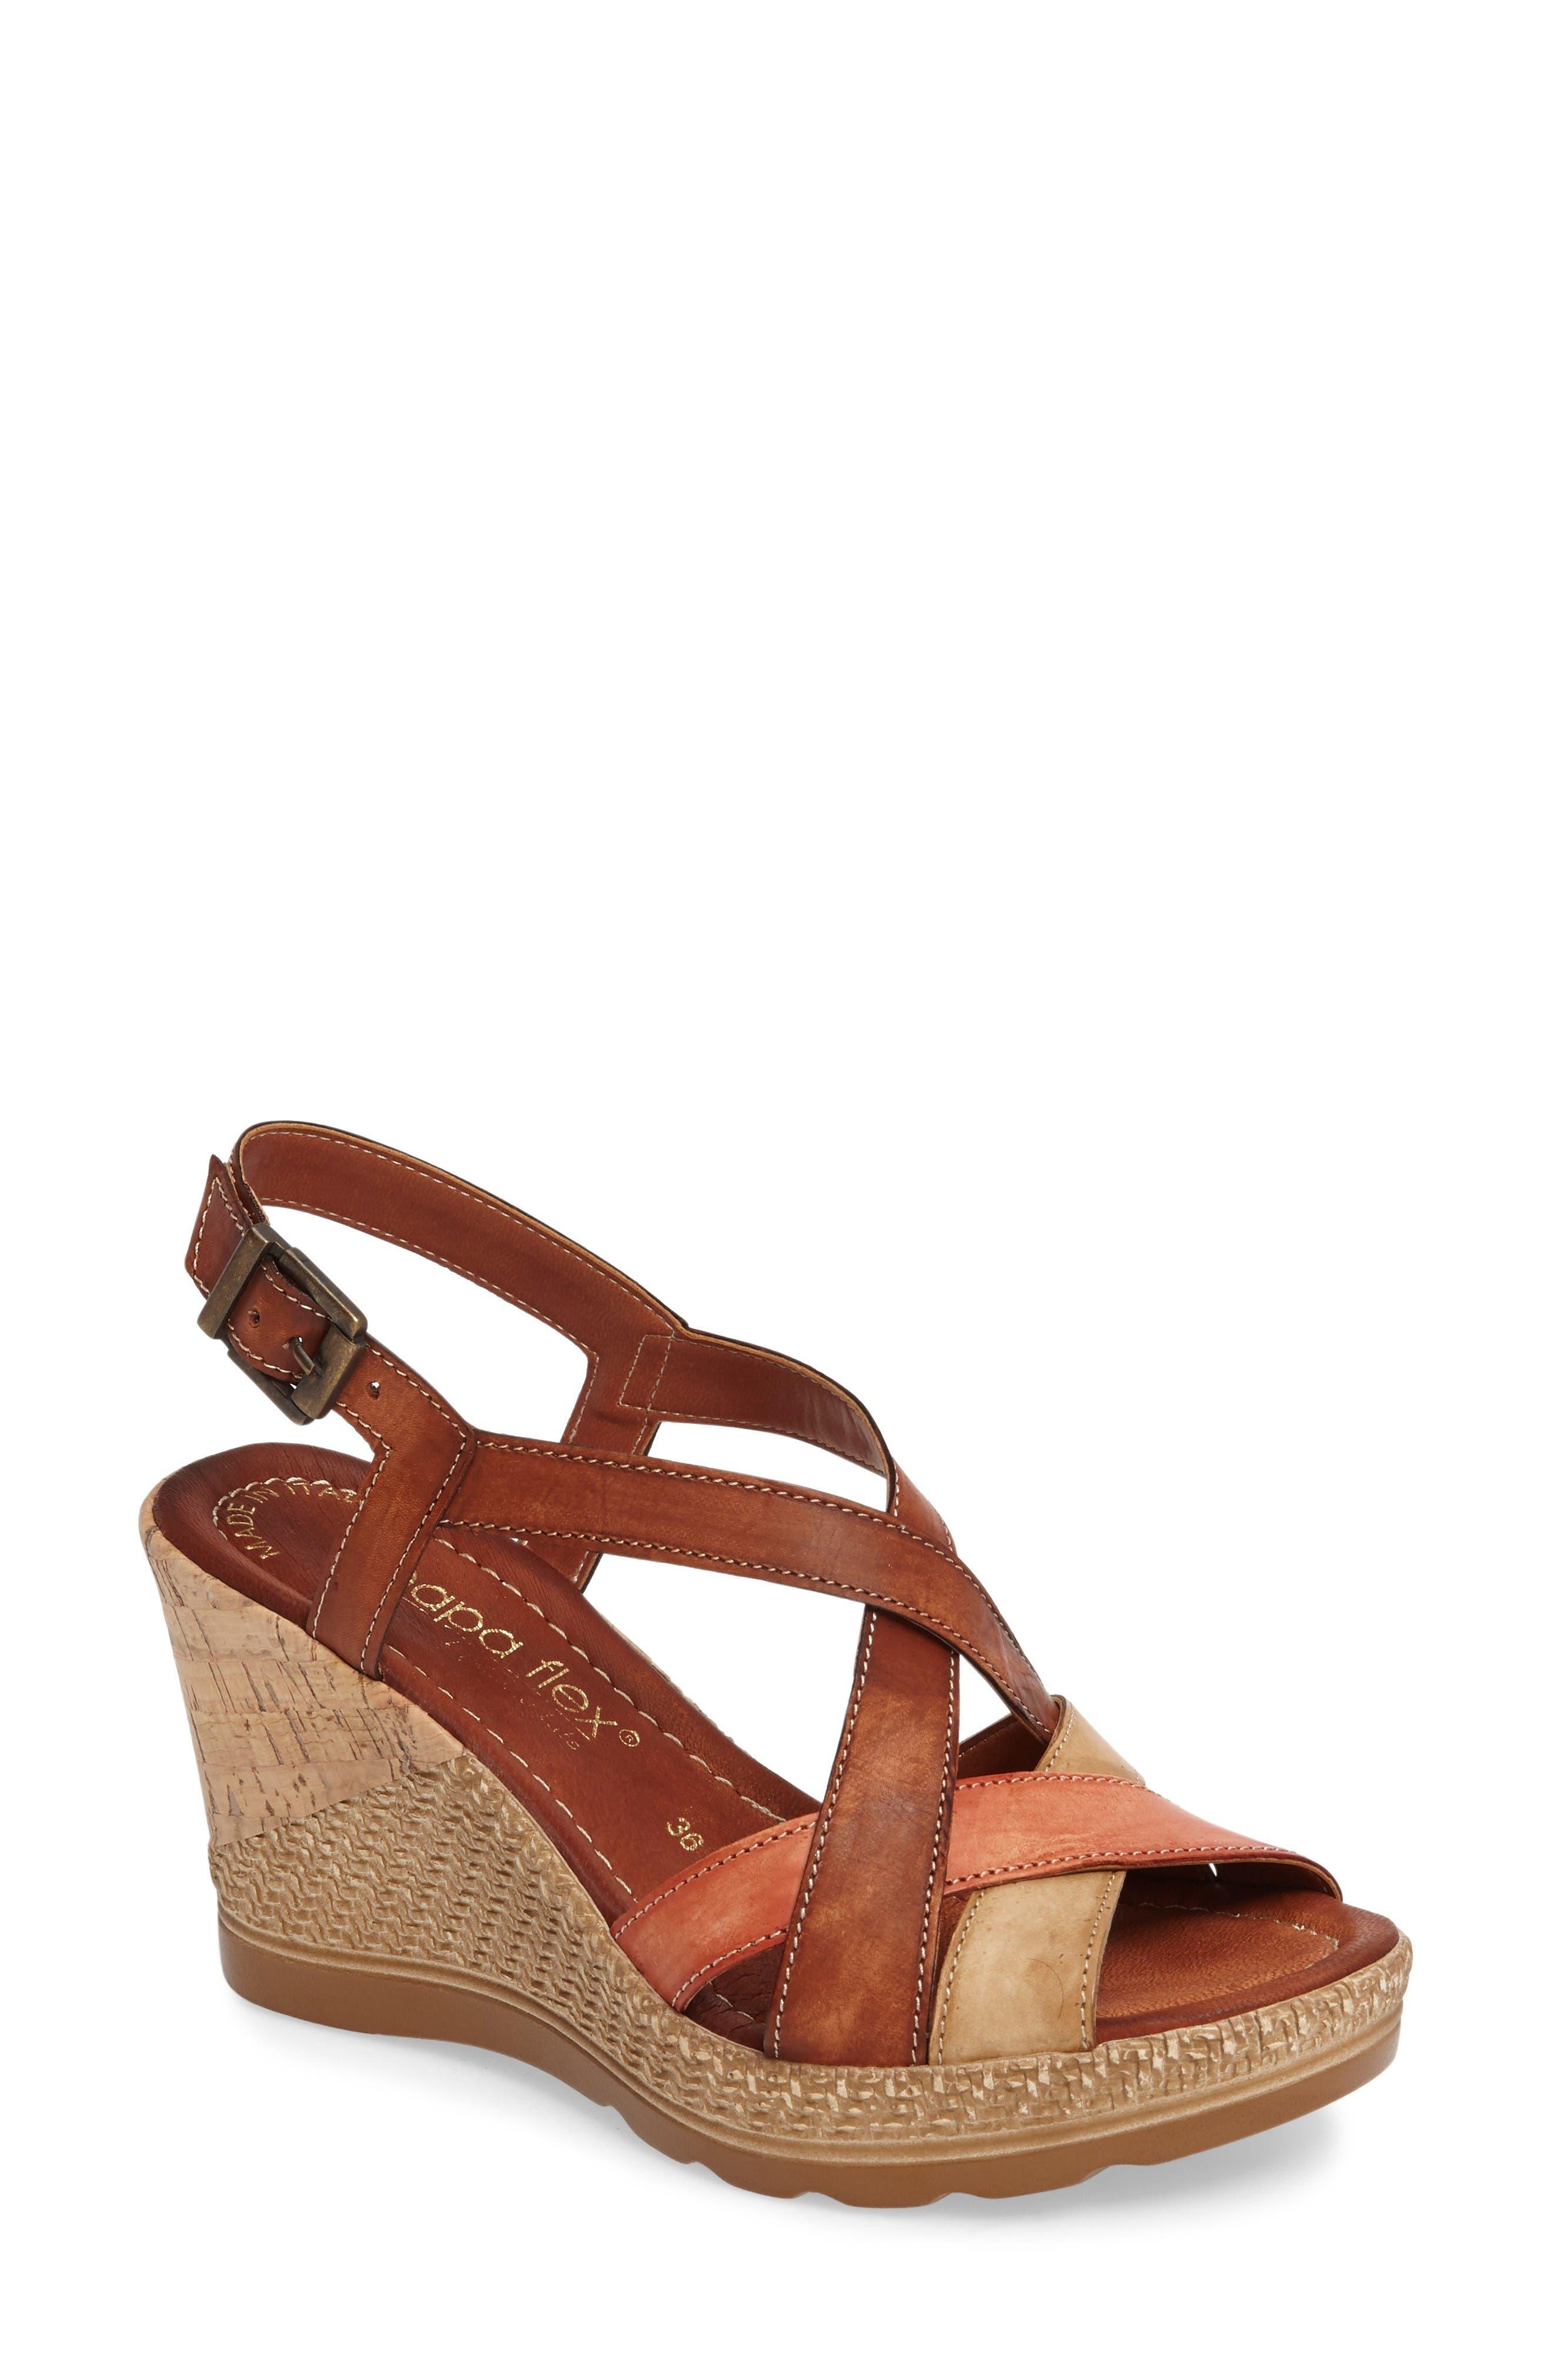 NAPA FLEX Modena Wedge Sandal